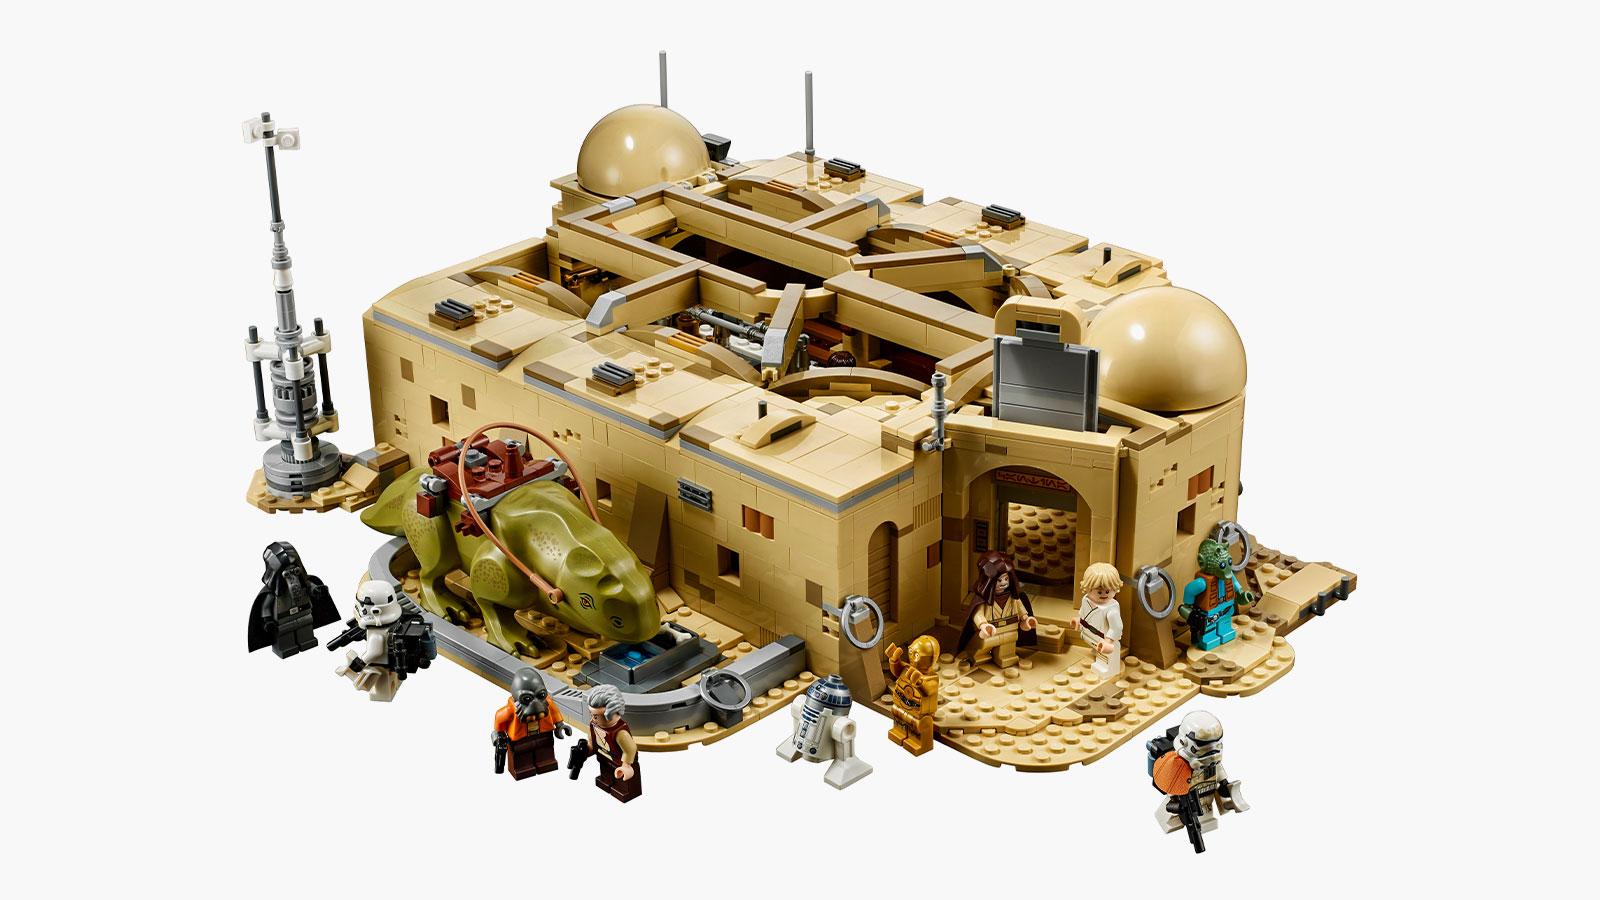 LEGO Star Wars Mos Eisley Cantina Set